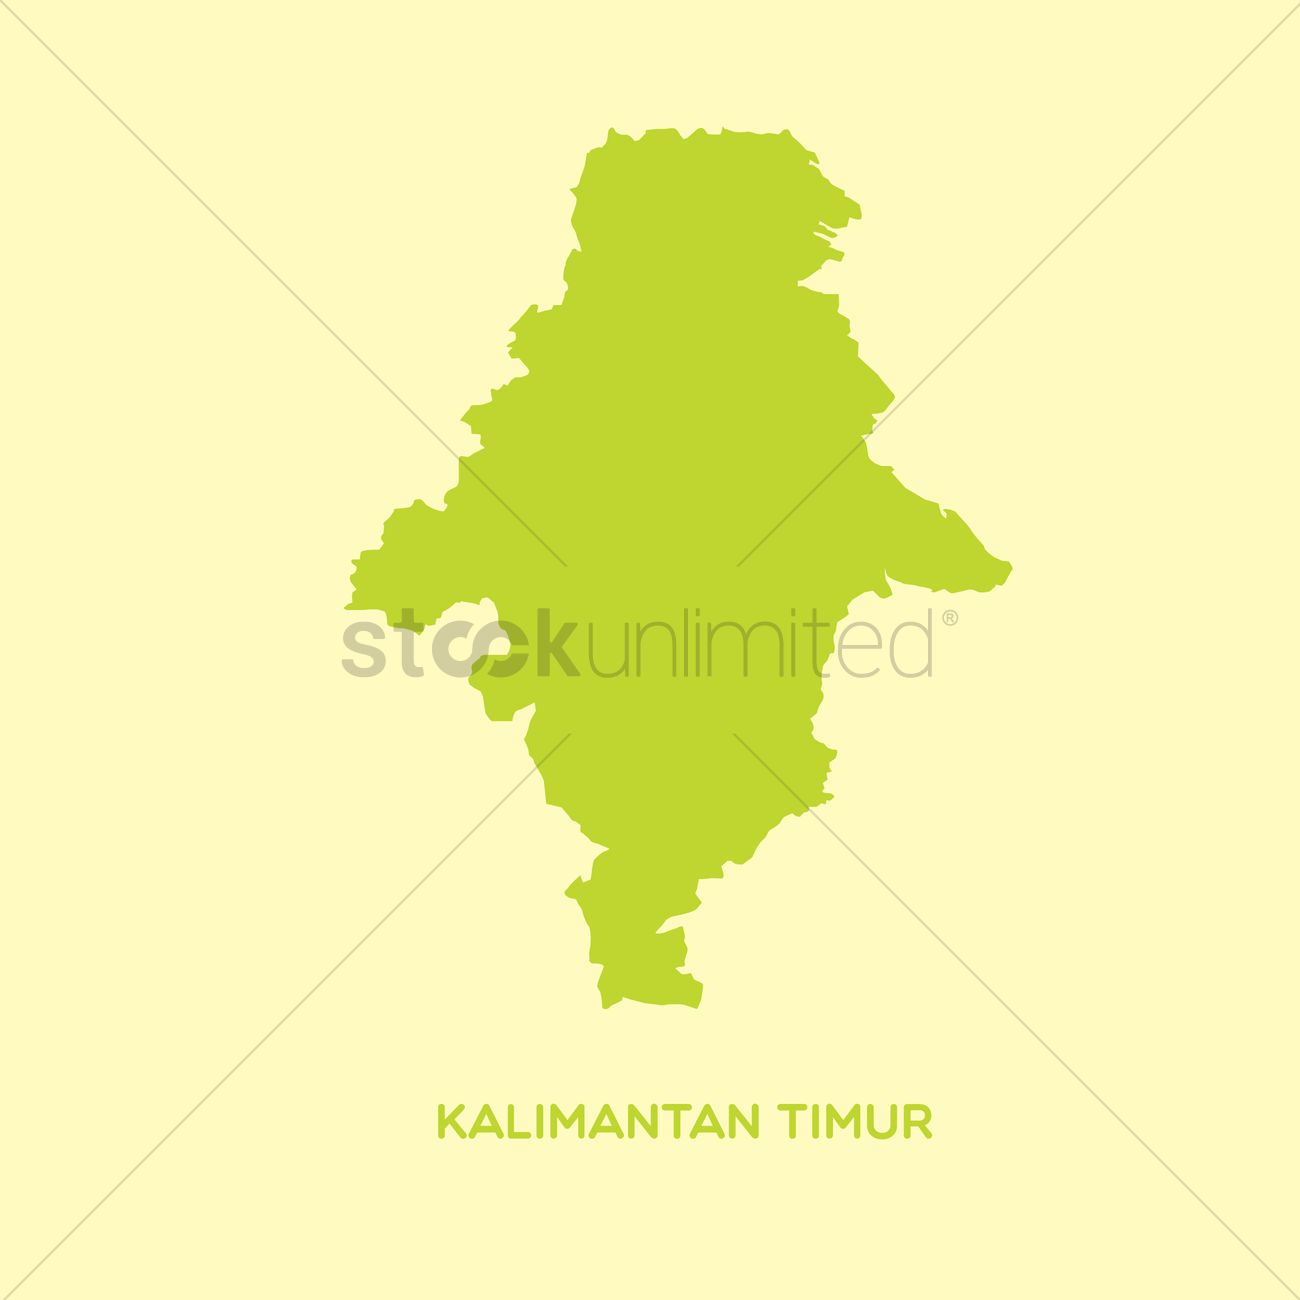 map of kalimantan timur vector image 1480443 stockunlimited map of kalimantan timur vector image